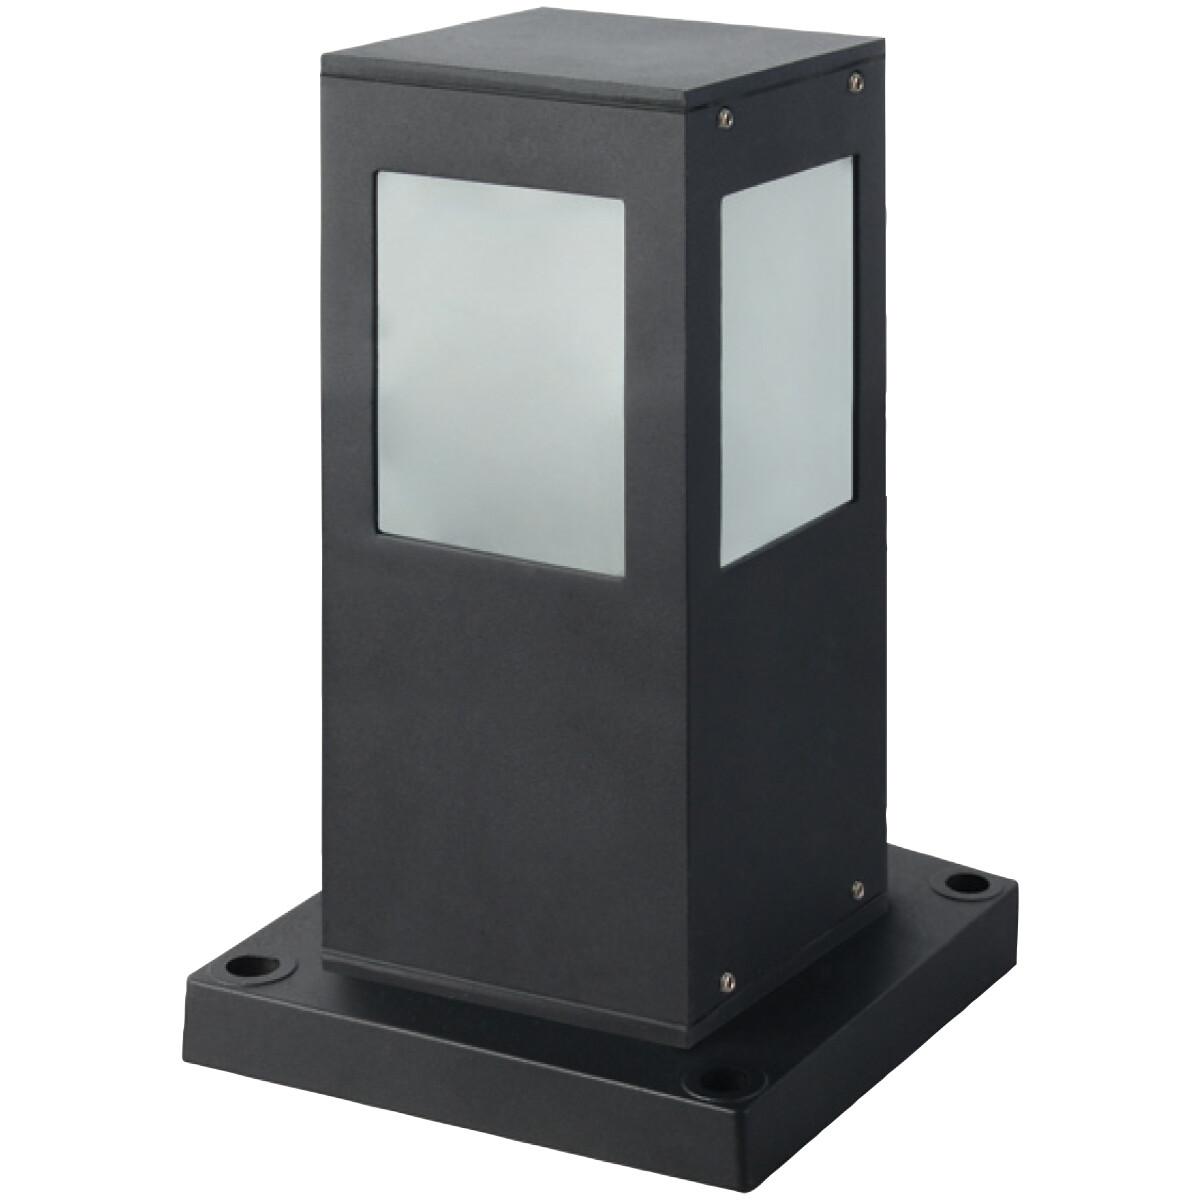 LED Tuinverlichting - Buitenlamp - Kavy 3 - Staand - Aluminium Mat Zwart - E27 - Vierkant